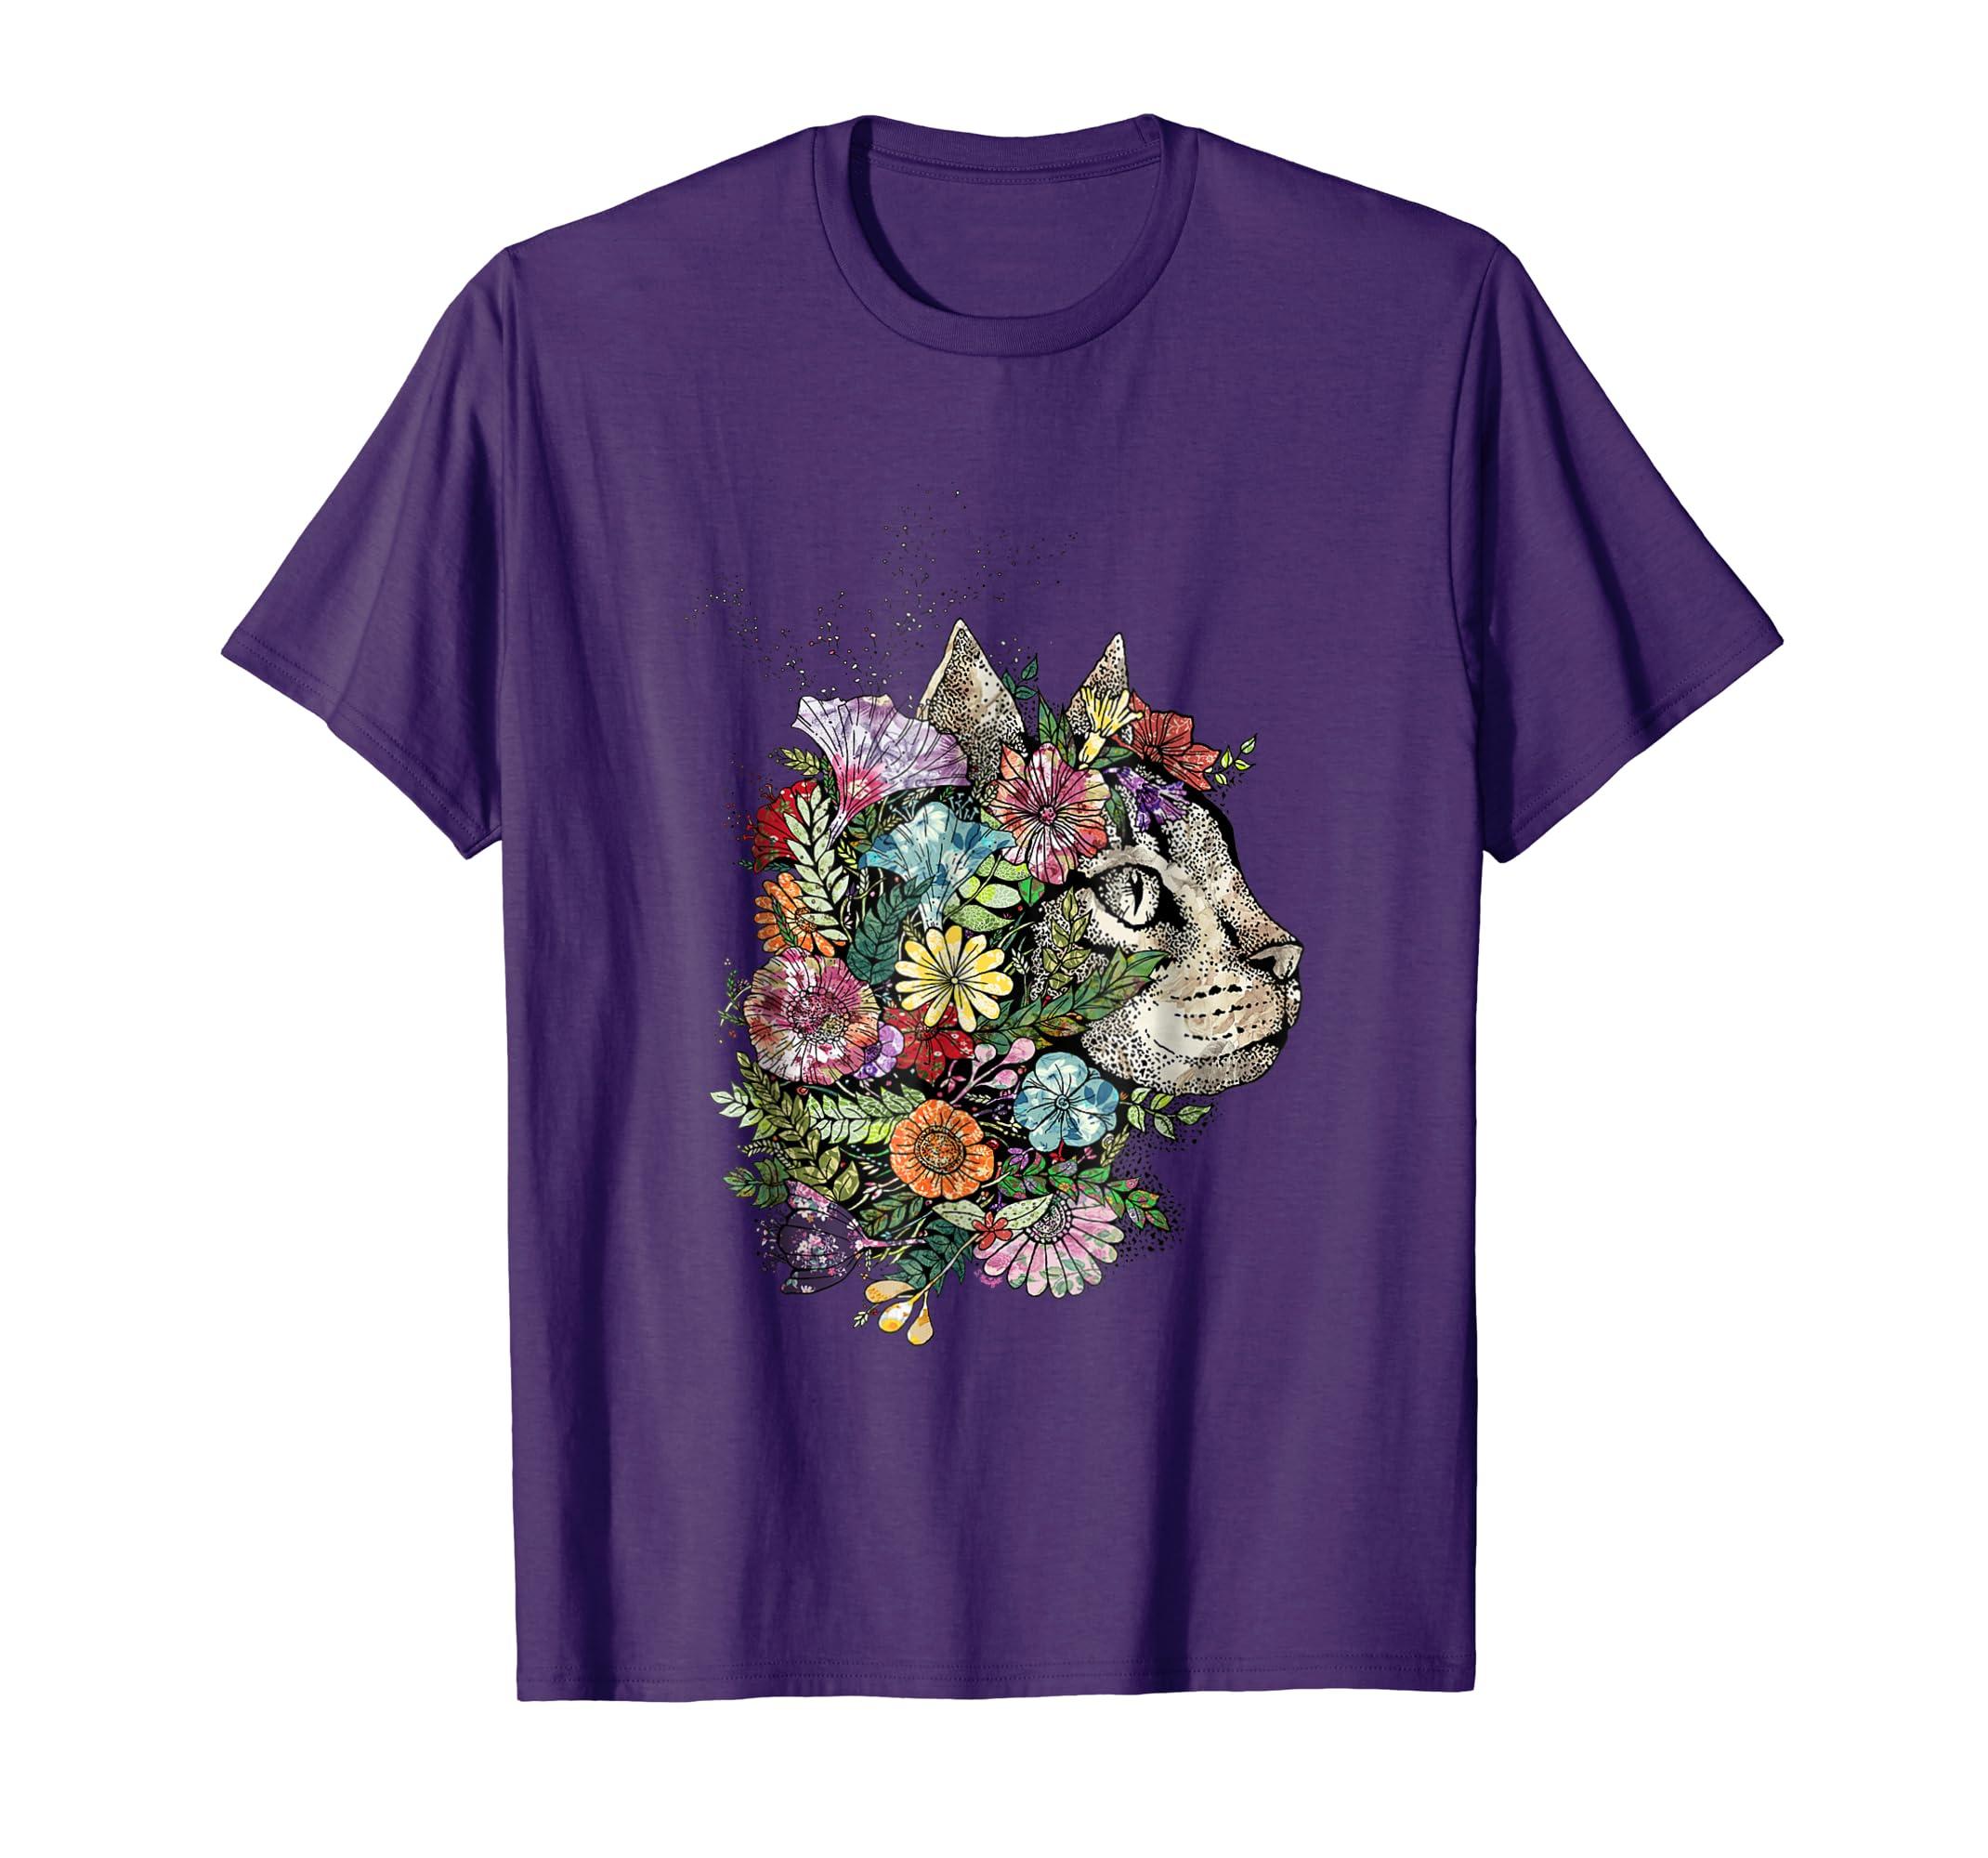 Gardening cat in a bouquet of flowers t-shirt-AZP